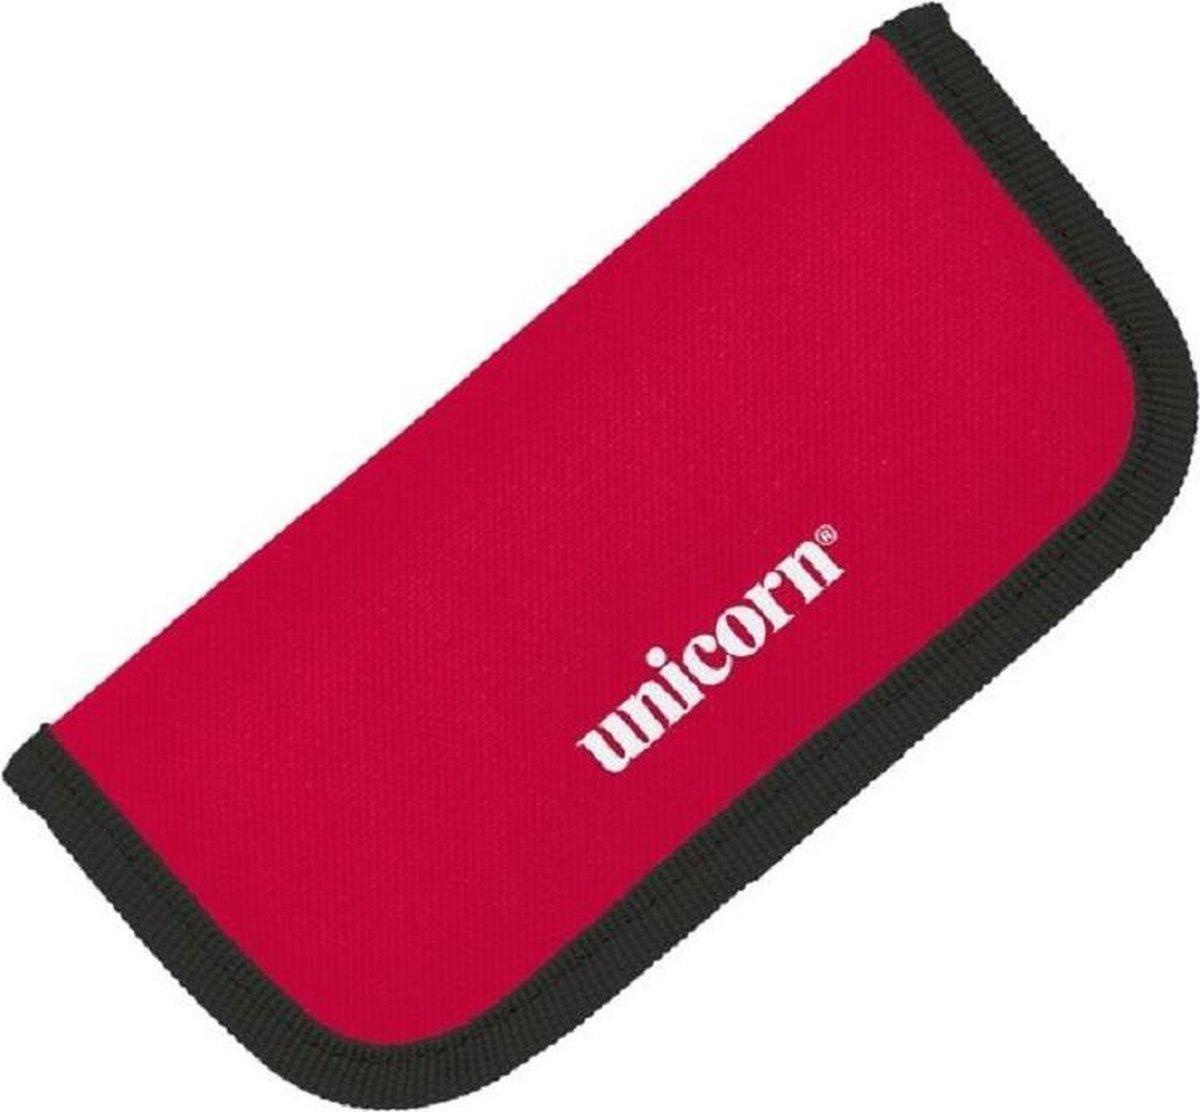 Unicorn Midi Velcro Case - Rood - Zwarte rand